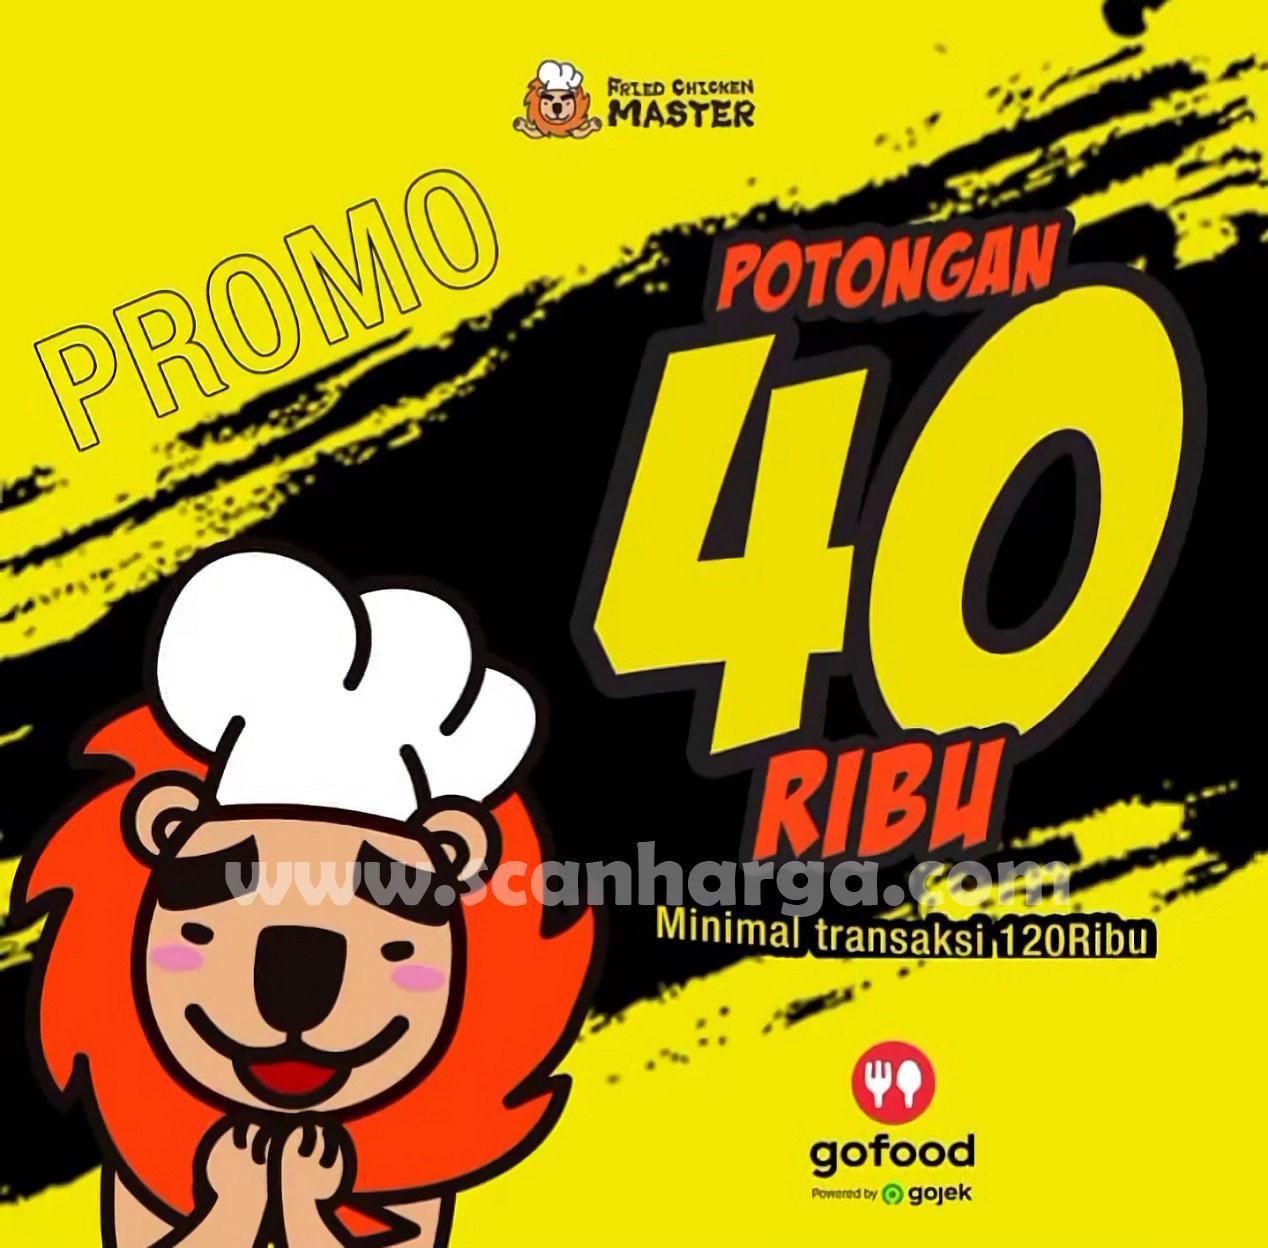 FRIED CHICKEN MASTER Spesial Promo GOFOOD! Diskon Rp 40.000